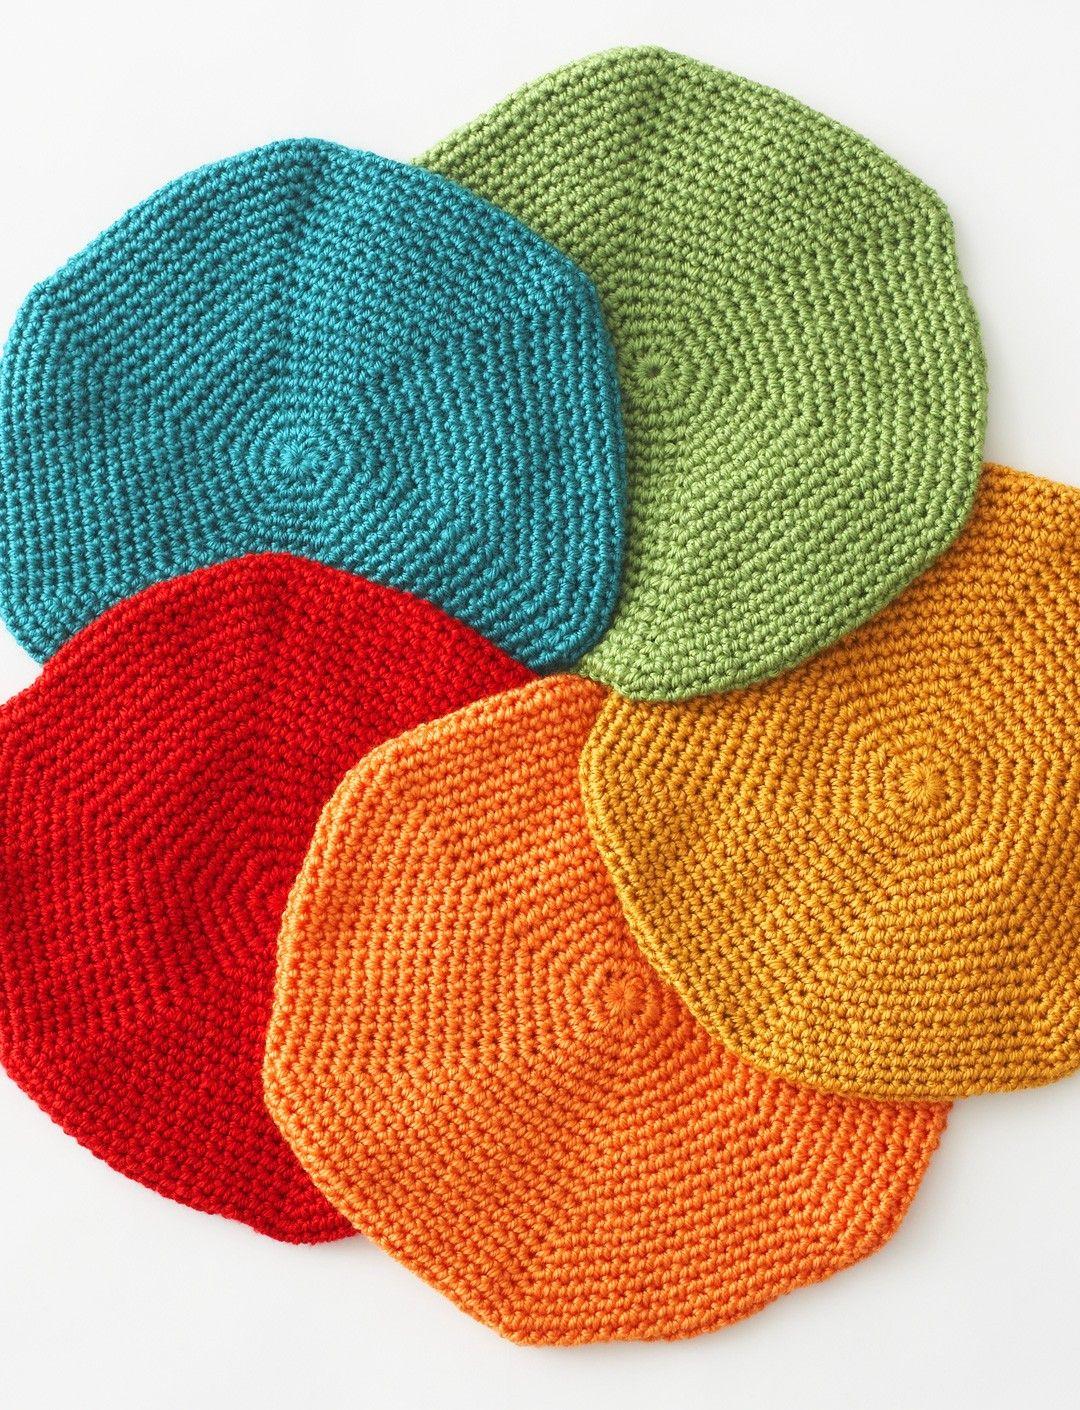 Classic Crochet Beret Patterns Yarnspirations